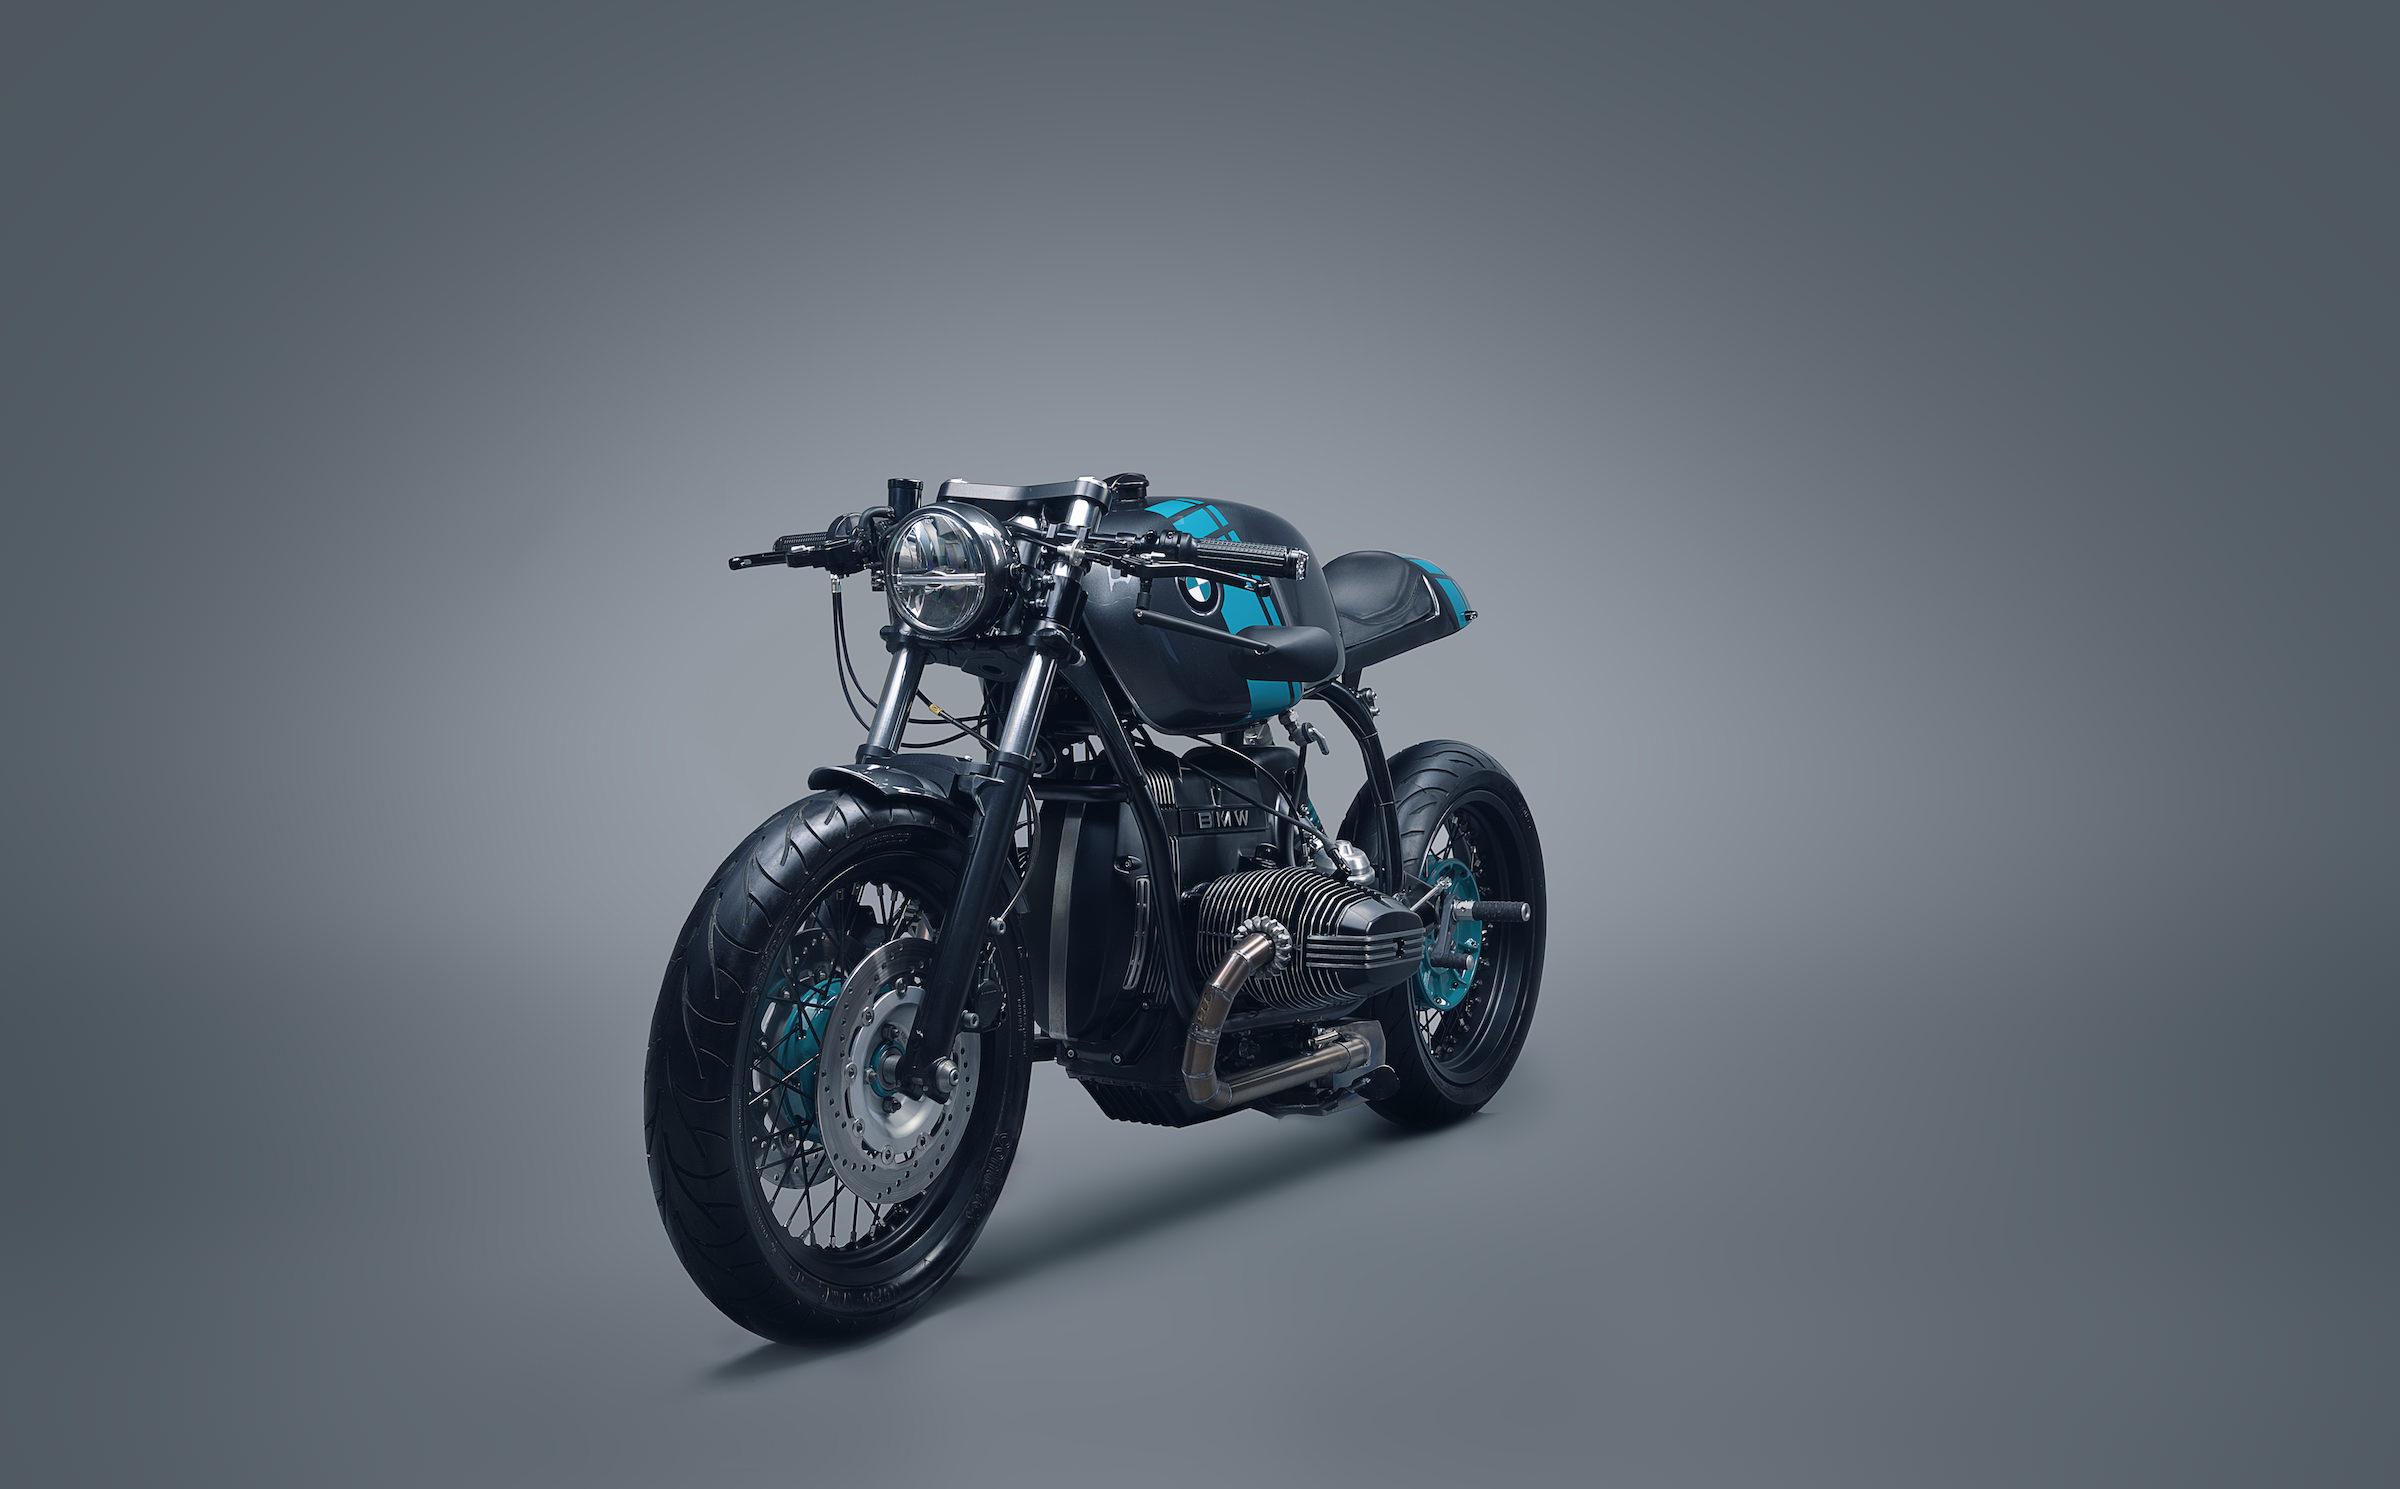 elemental custom cycles bmw r80 monolever cafe racer project 4. Black Bedroom Furniture Sets. Home Design Ideas